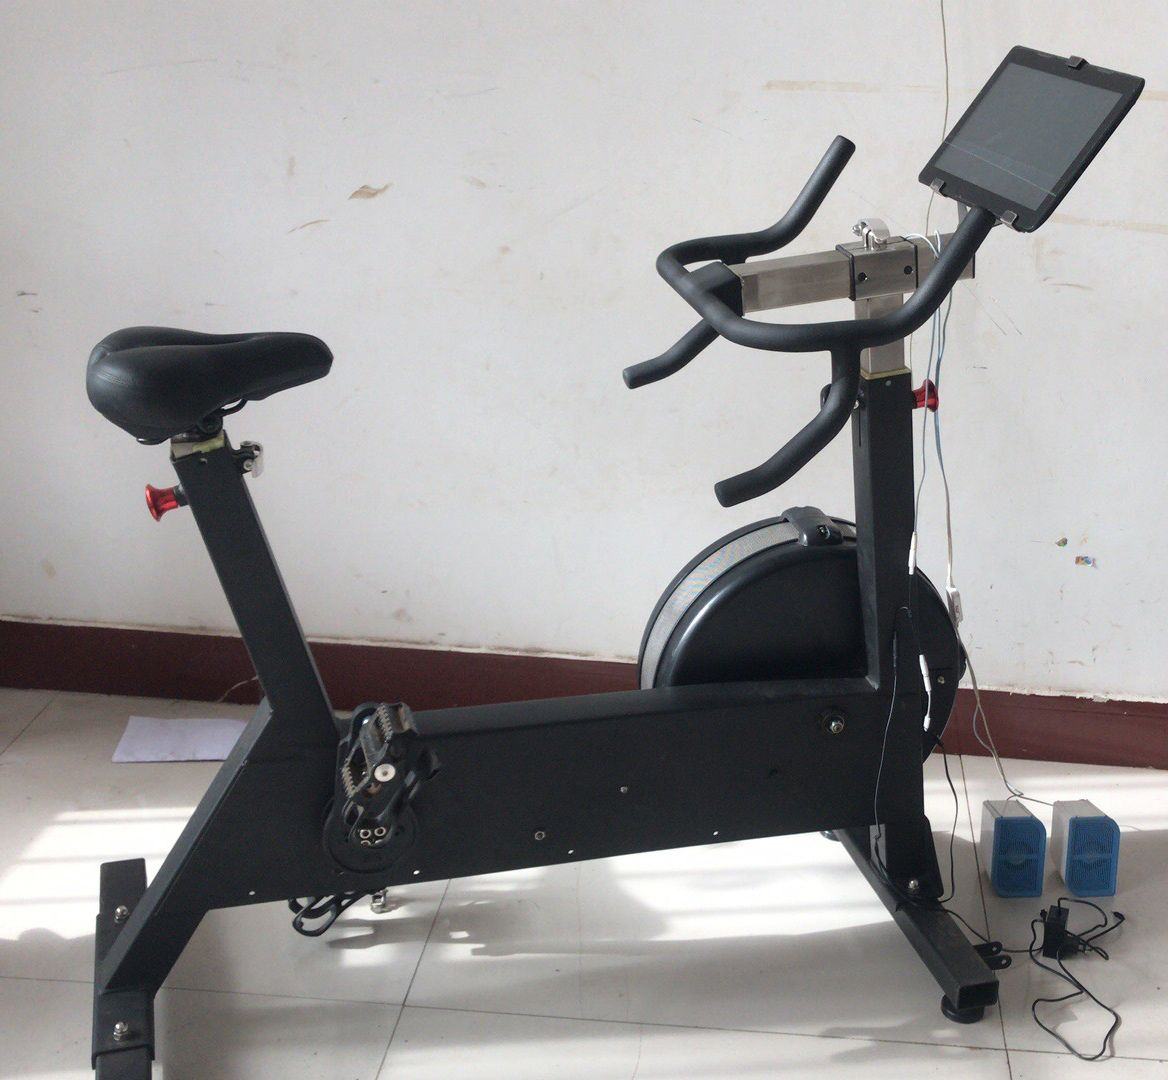 Concept 2 Bikeerg From Kic Fitness In China Cardio Machine